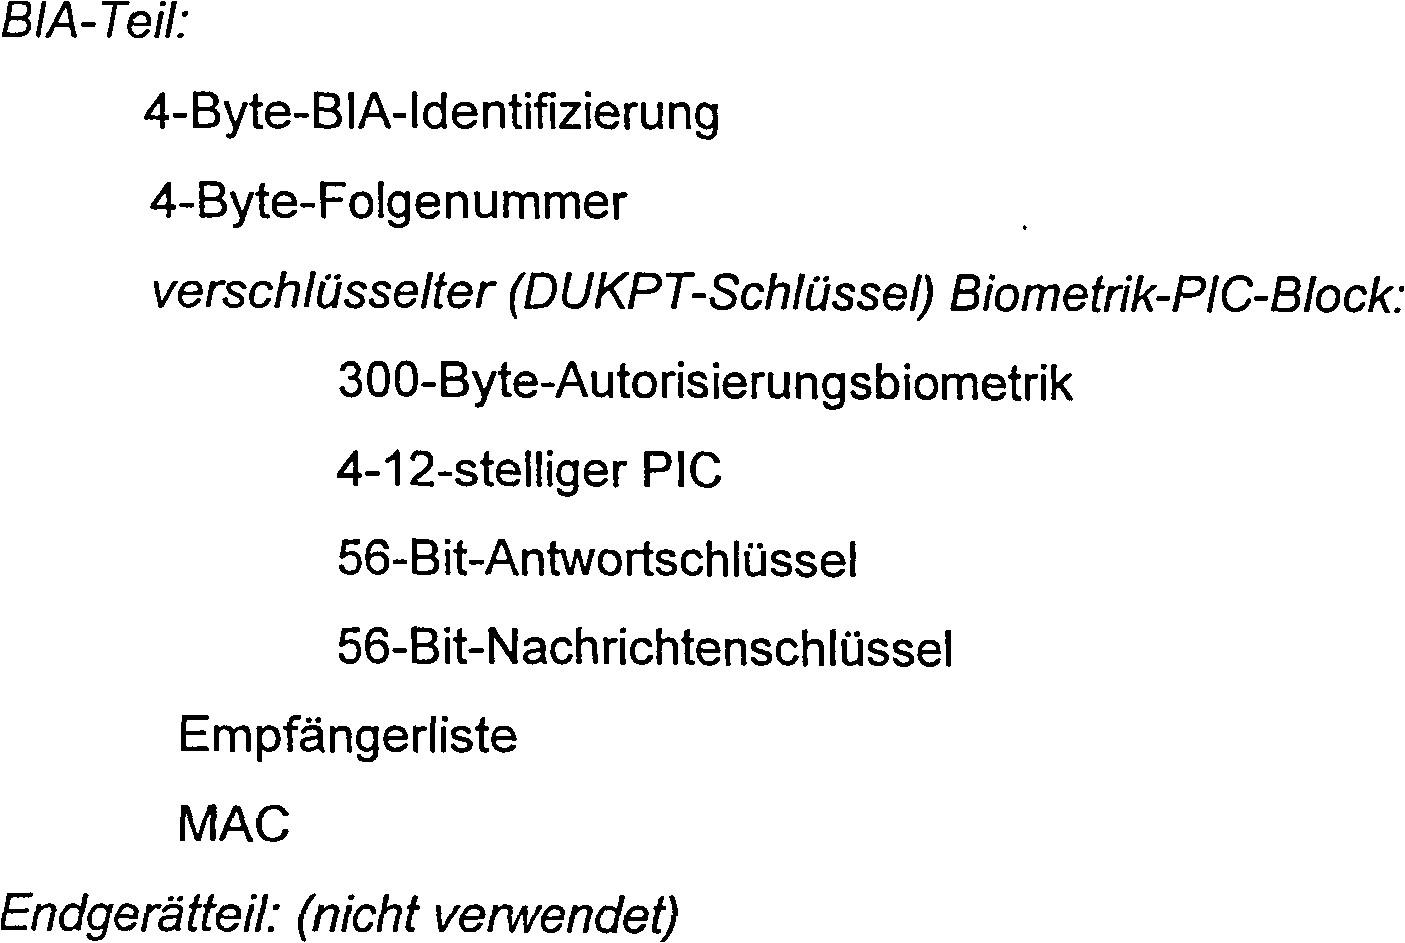 Unique Card Services Phone Number De69630713t2 Identifikationssystem Ohne Identitatsmarker